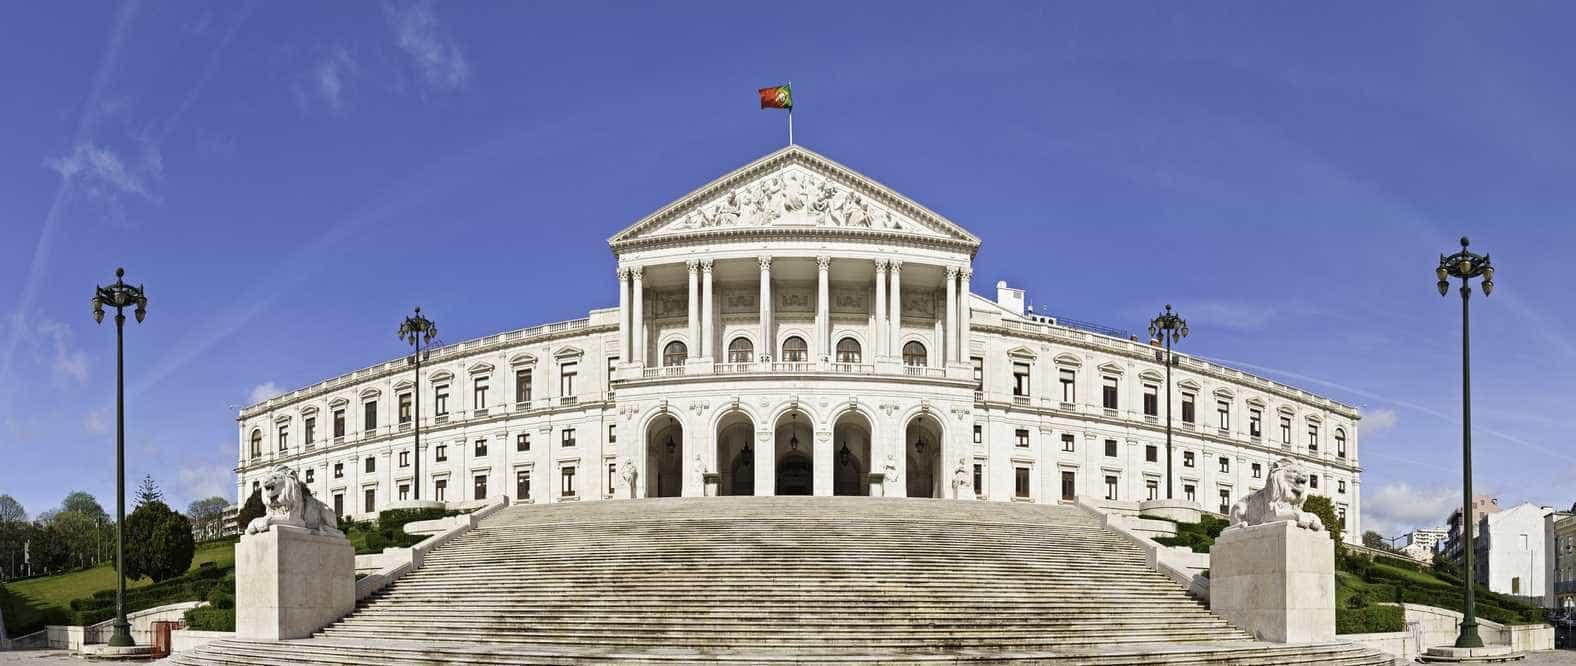 Proposta do Bloco para novo imposto sobre gigantes digitais criticada